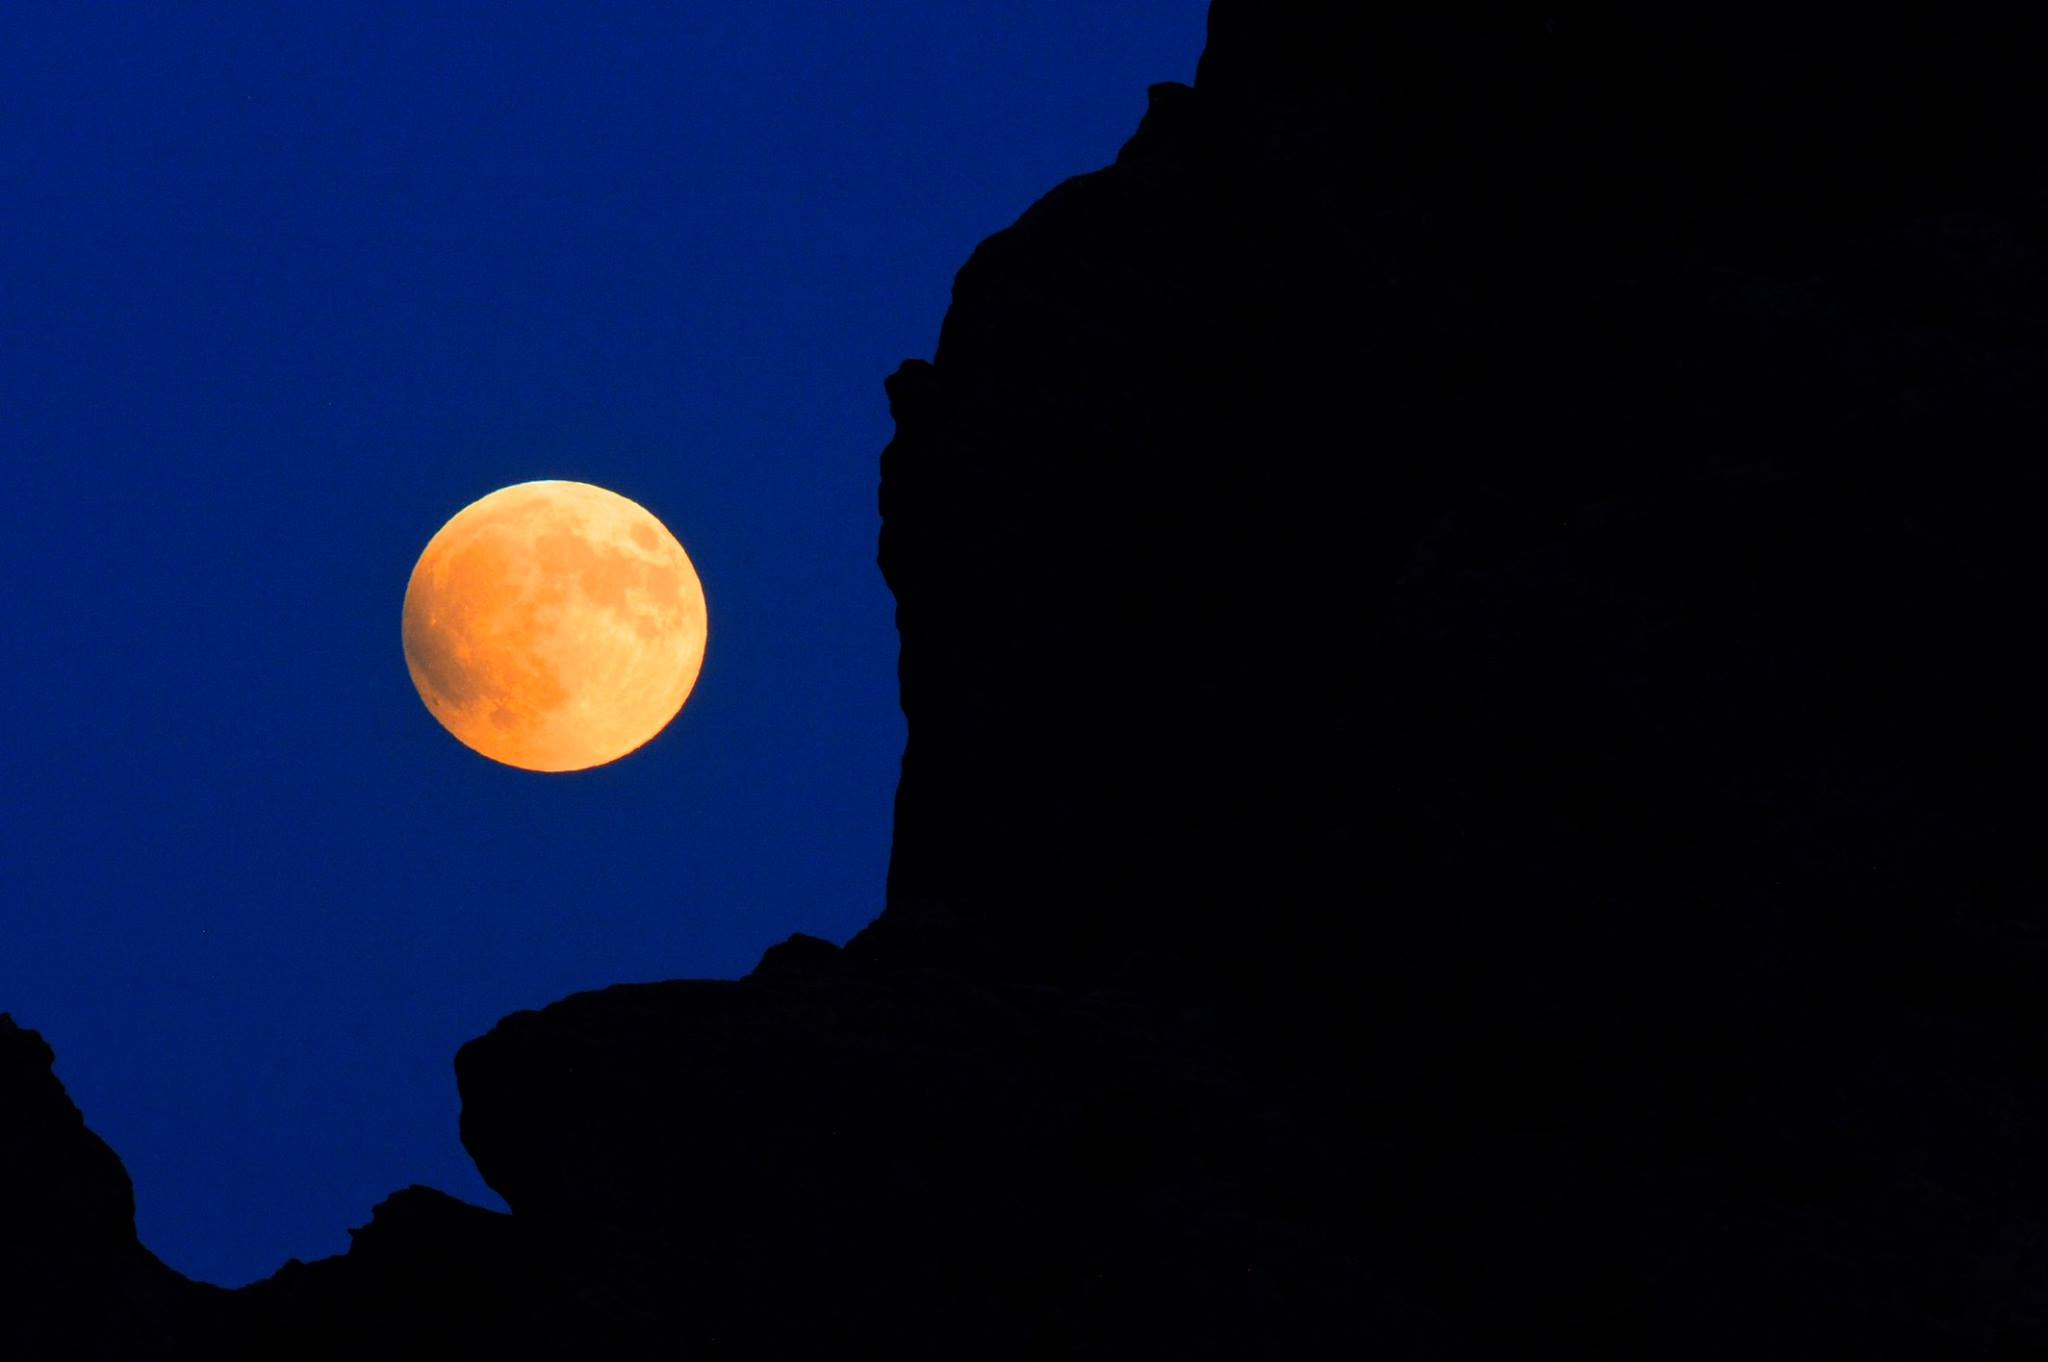 A rare supermoon eclipse took place over the Garden of the Gods Park in Colorado Springs, Colorado on Sunday, September 27, 2015.